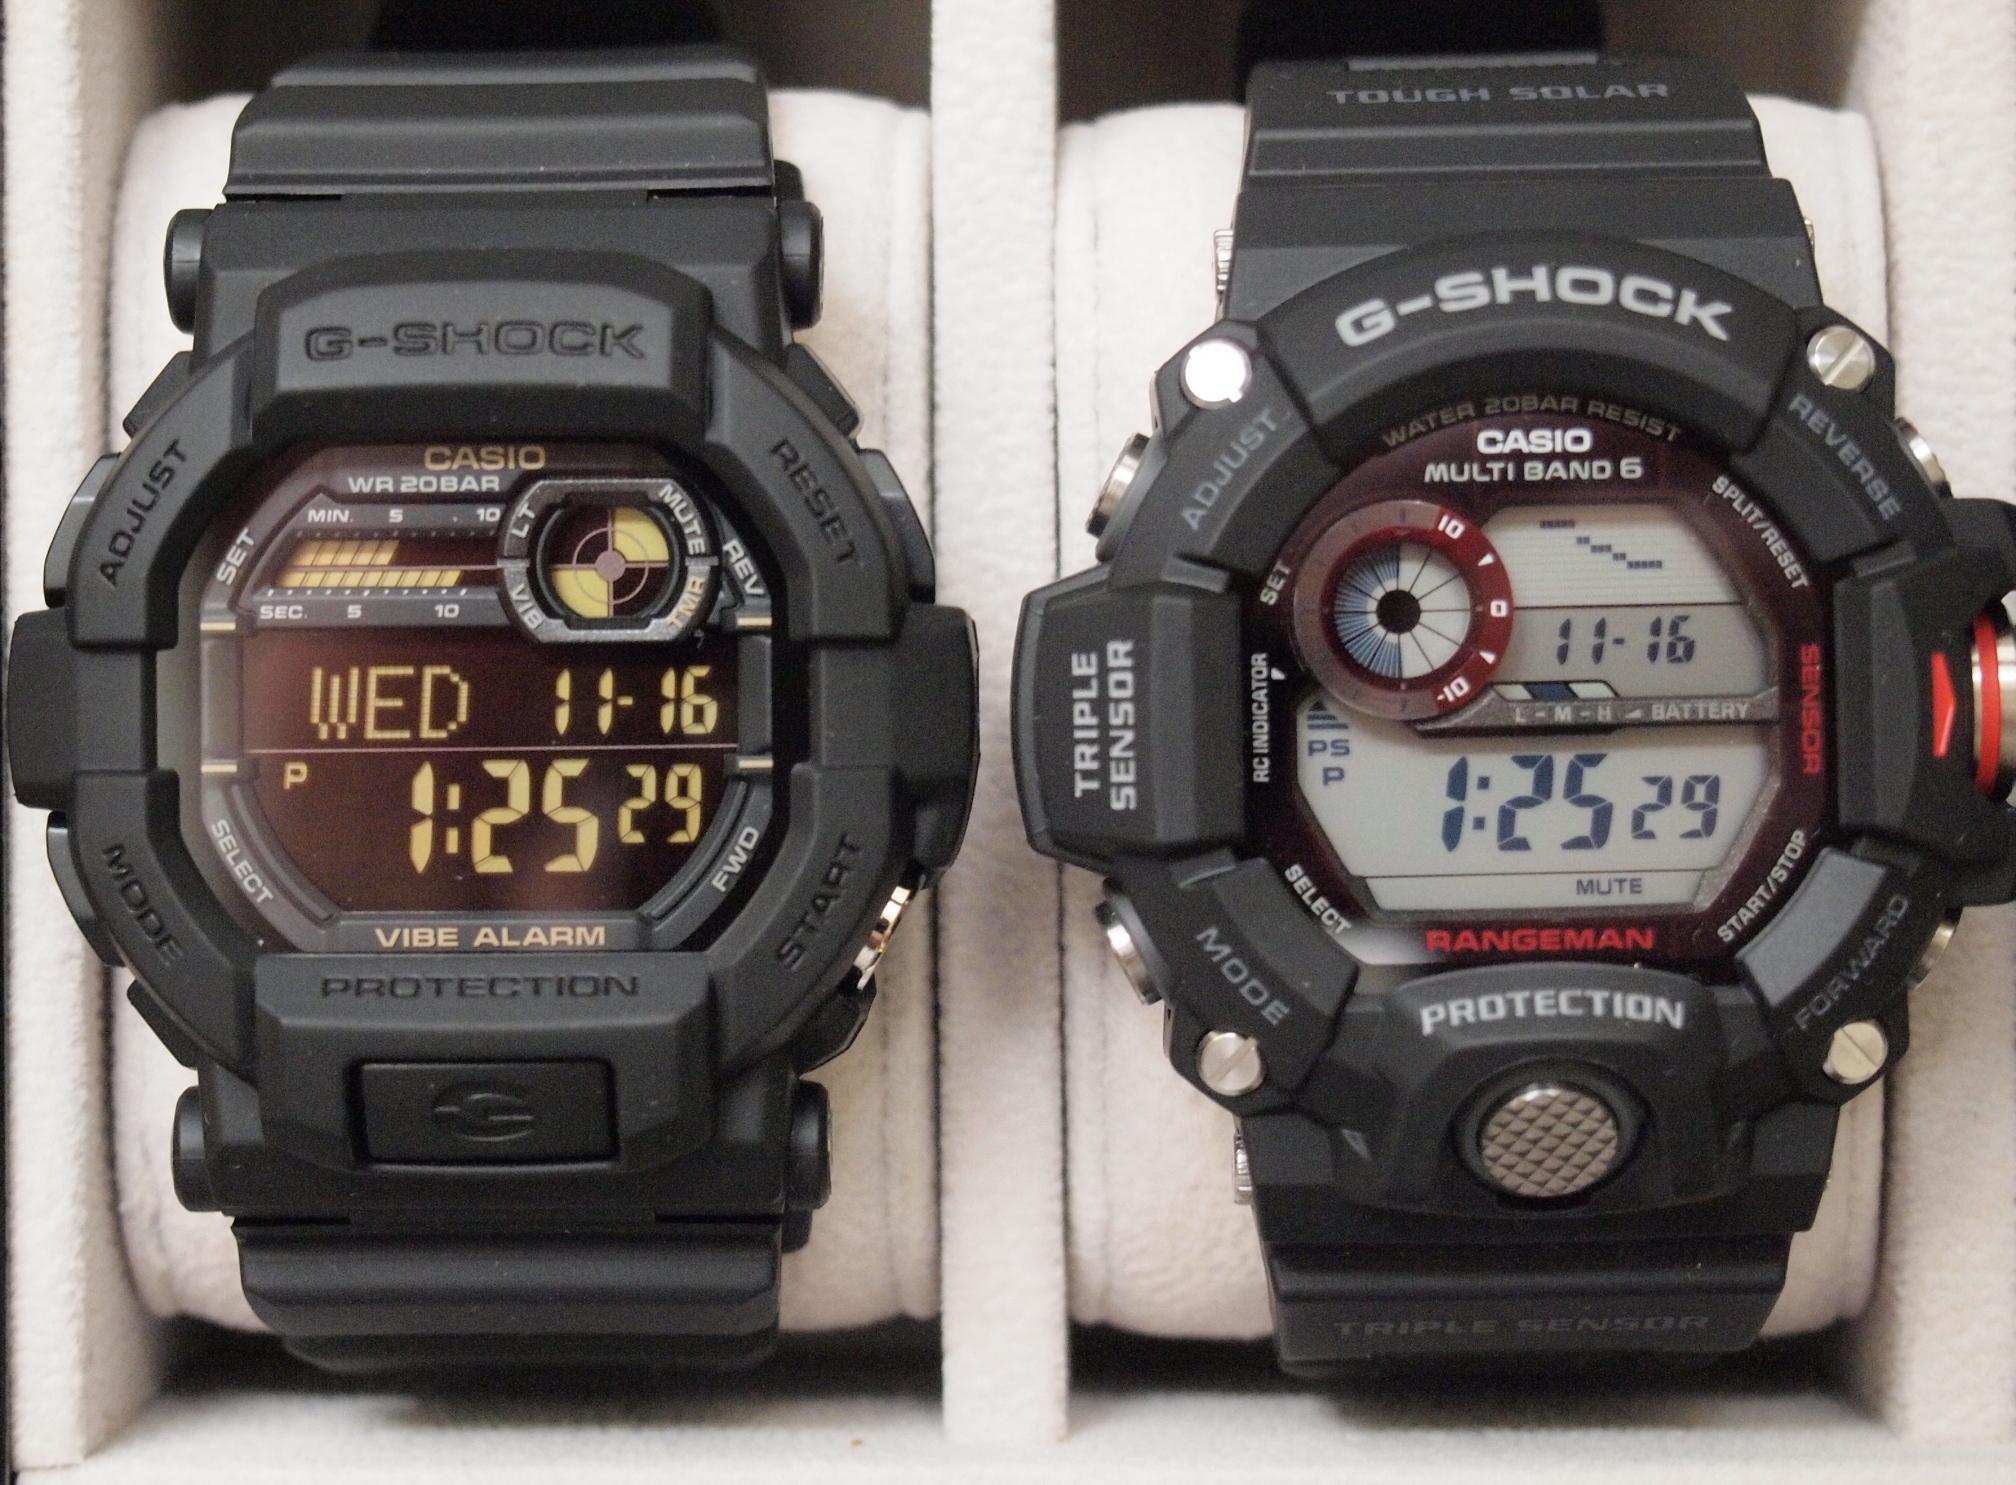 Name:  GD-350-1B, Rangeman GW-9400-1 (PB160190).JPG Views: 310 Size:  1.35 MB